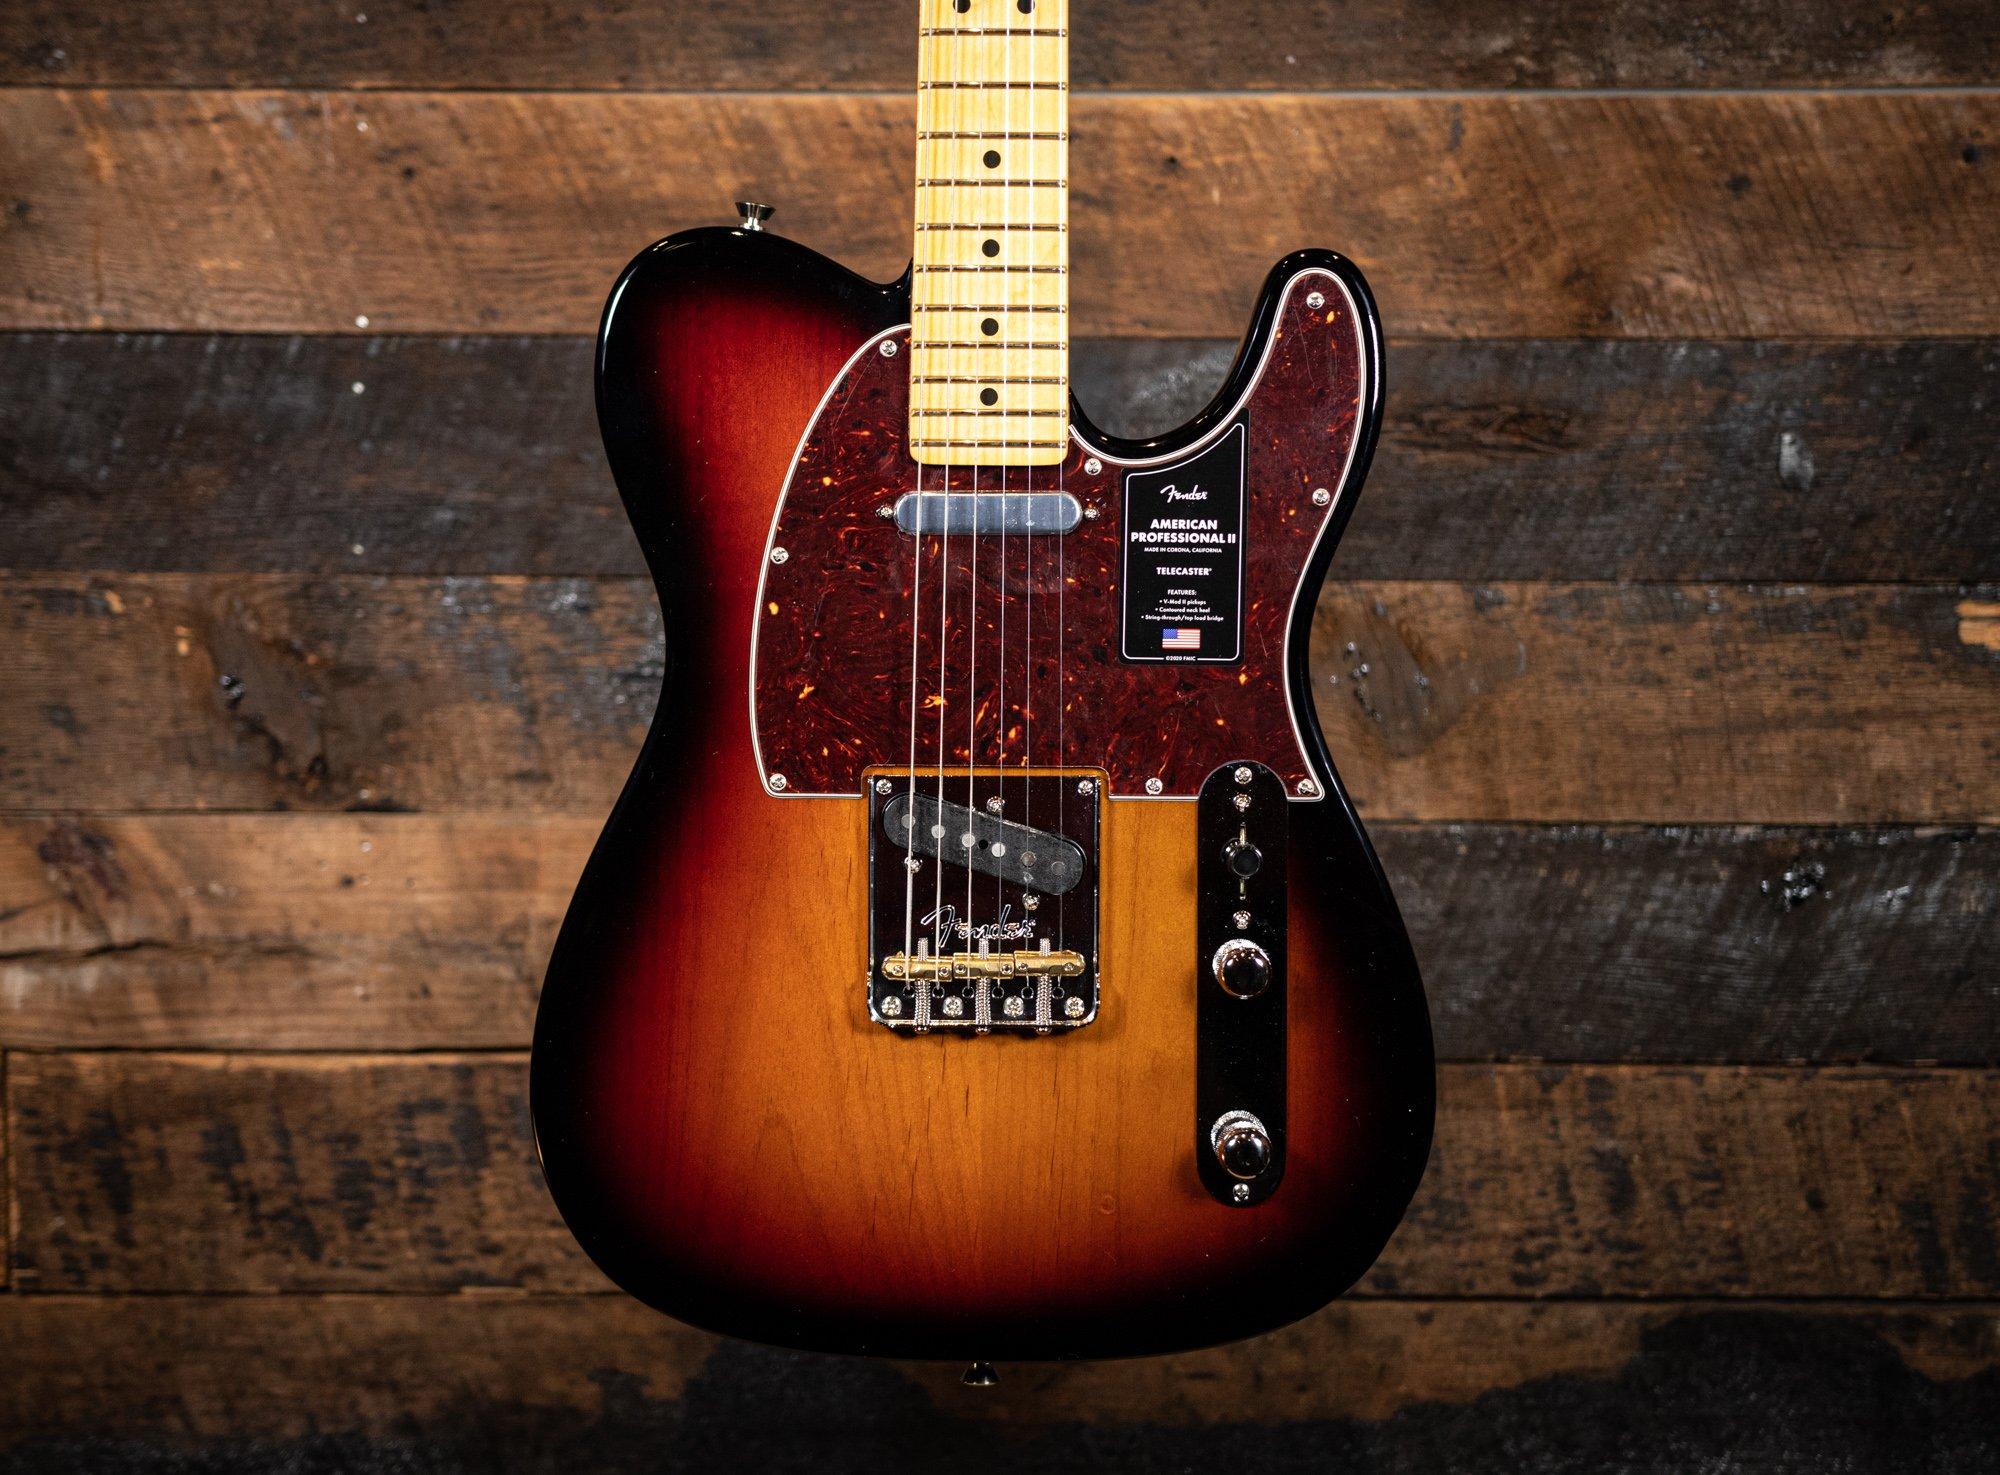 Fender American Pro II Telecaster in 3-tone Sunburst